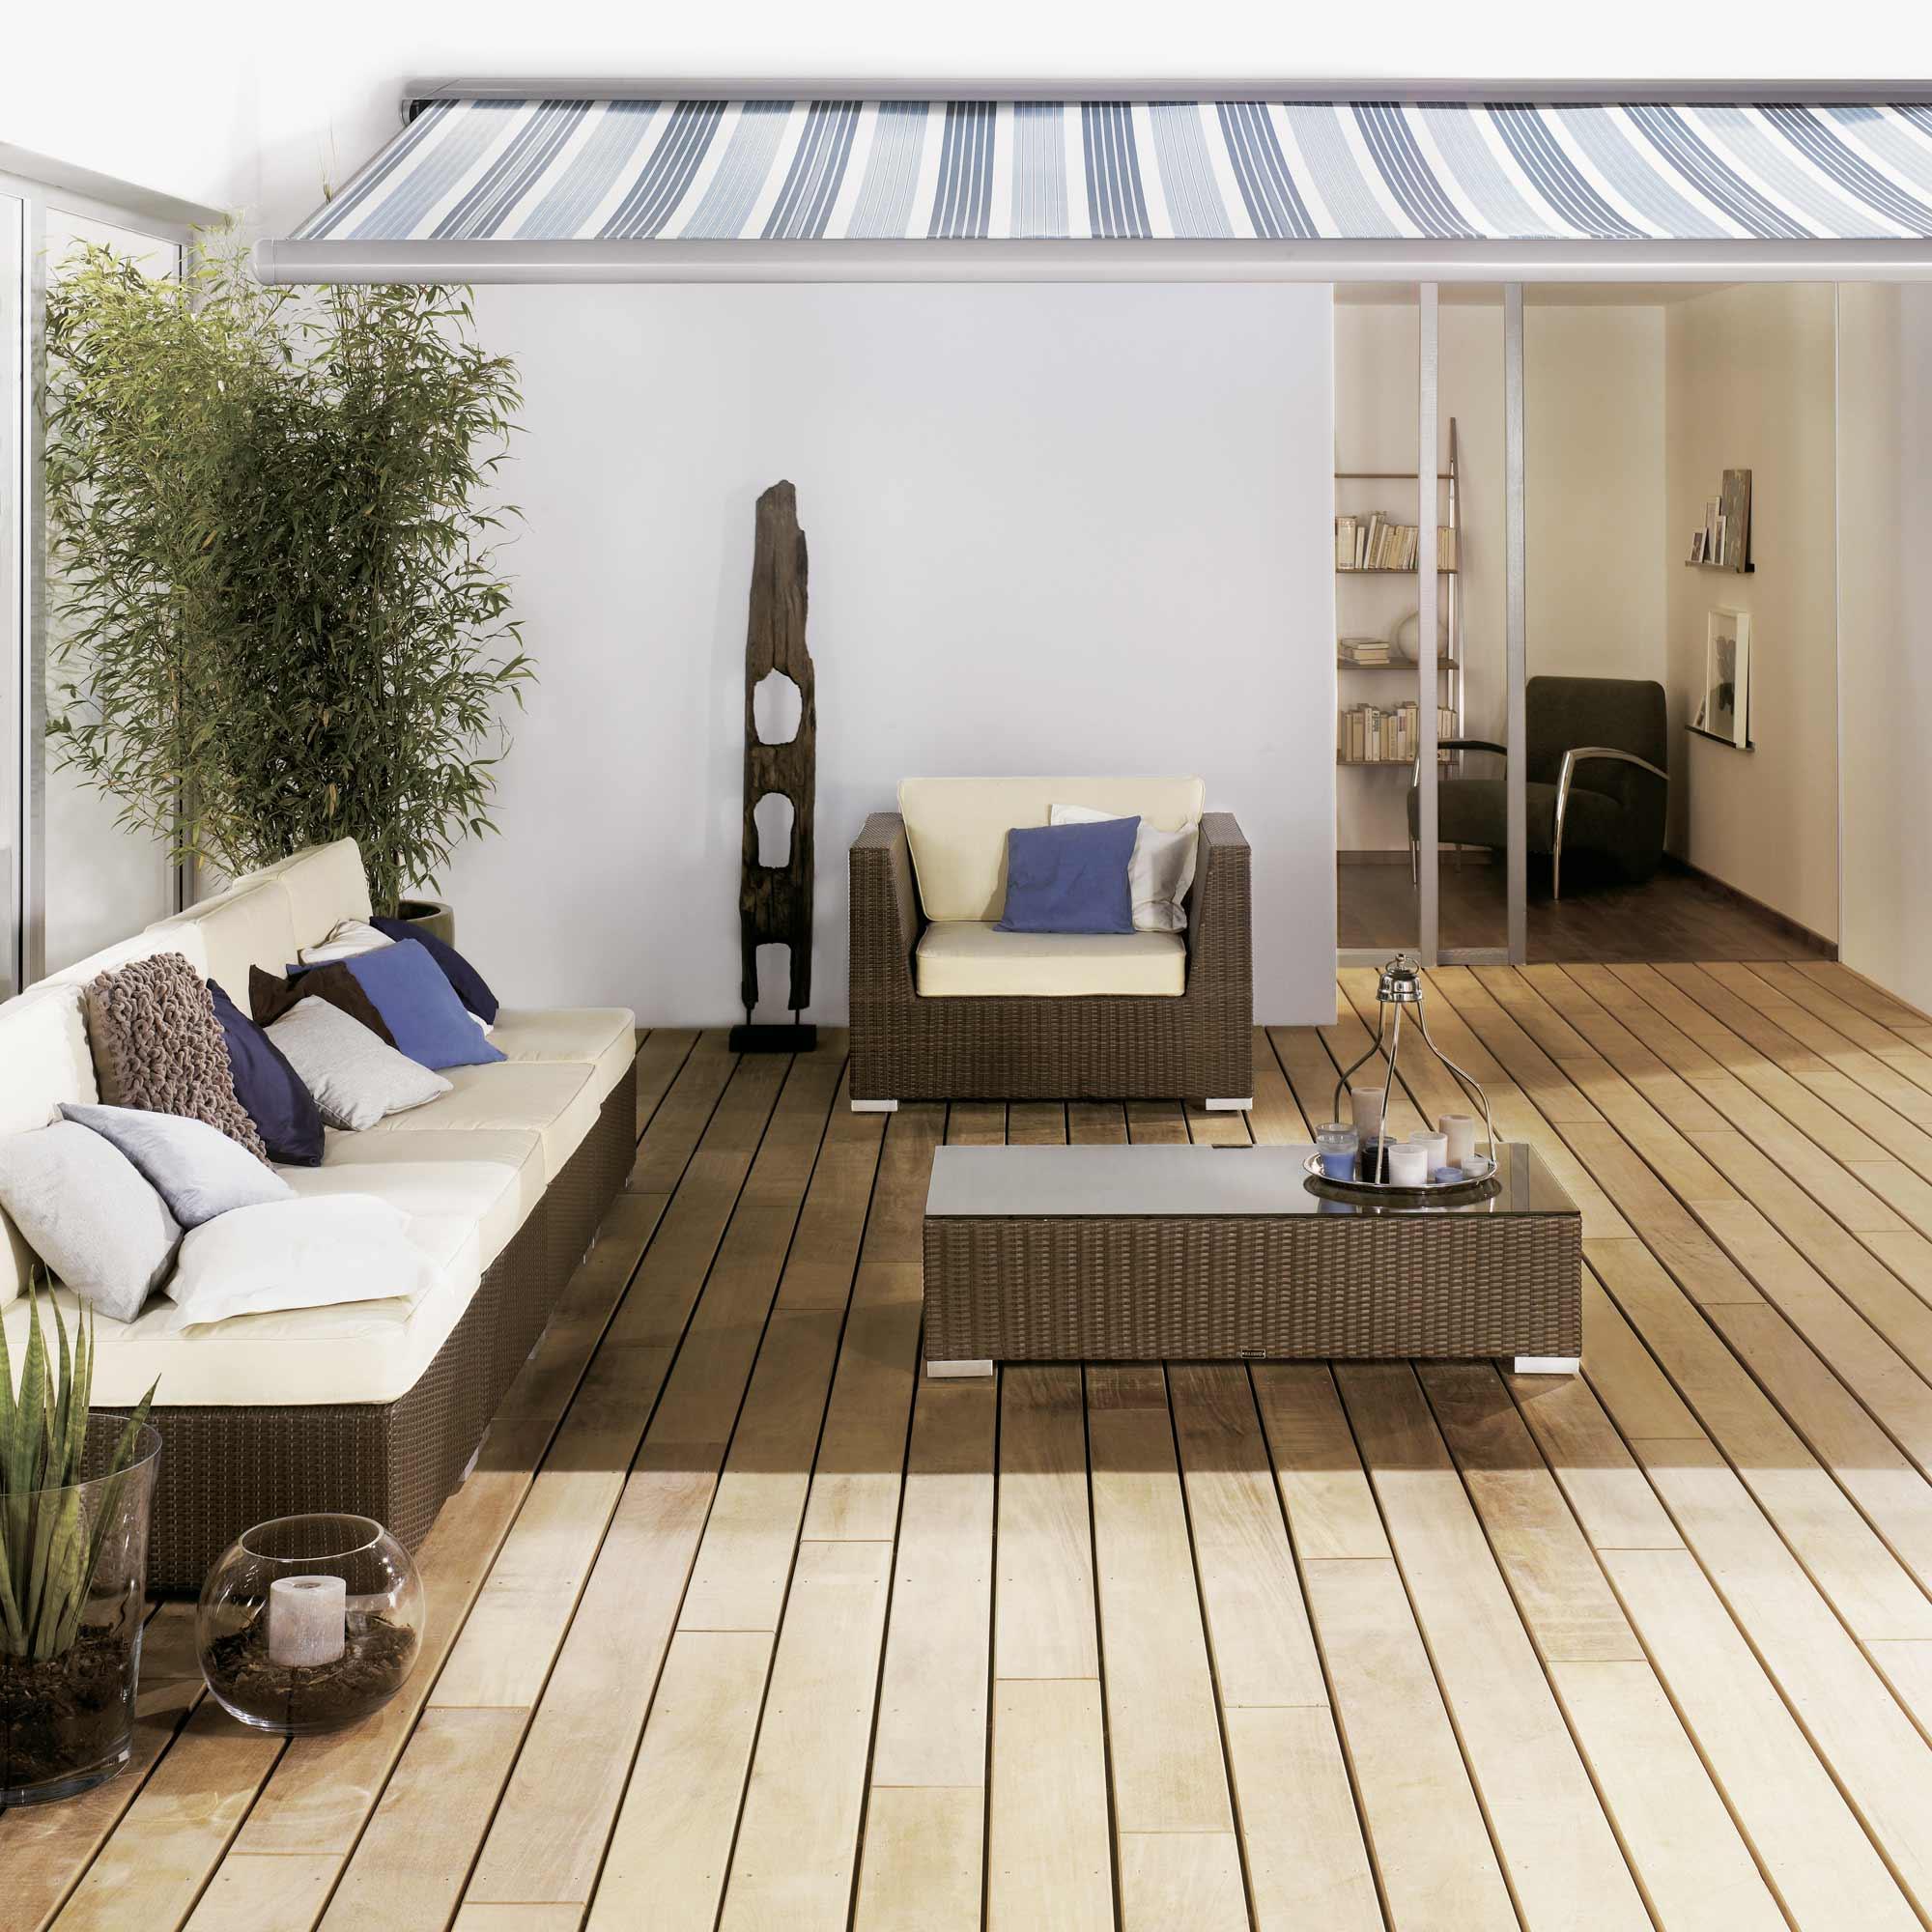 Terrassendielen aus Holz mit Gartenmöbeln dekoriert   Holzland Verbeek